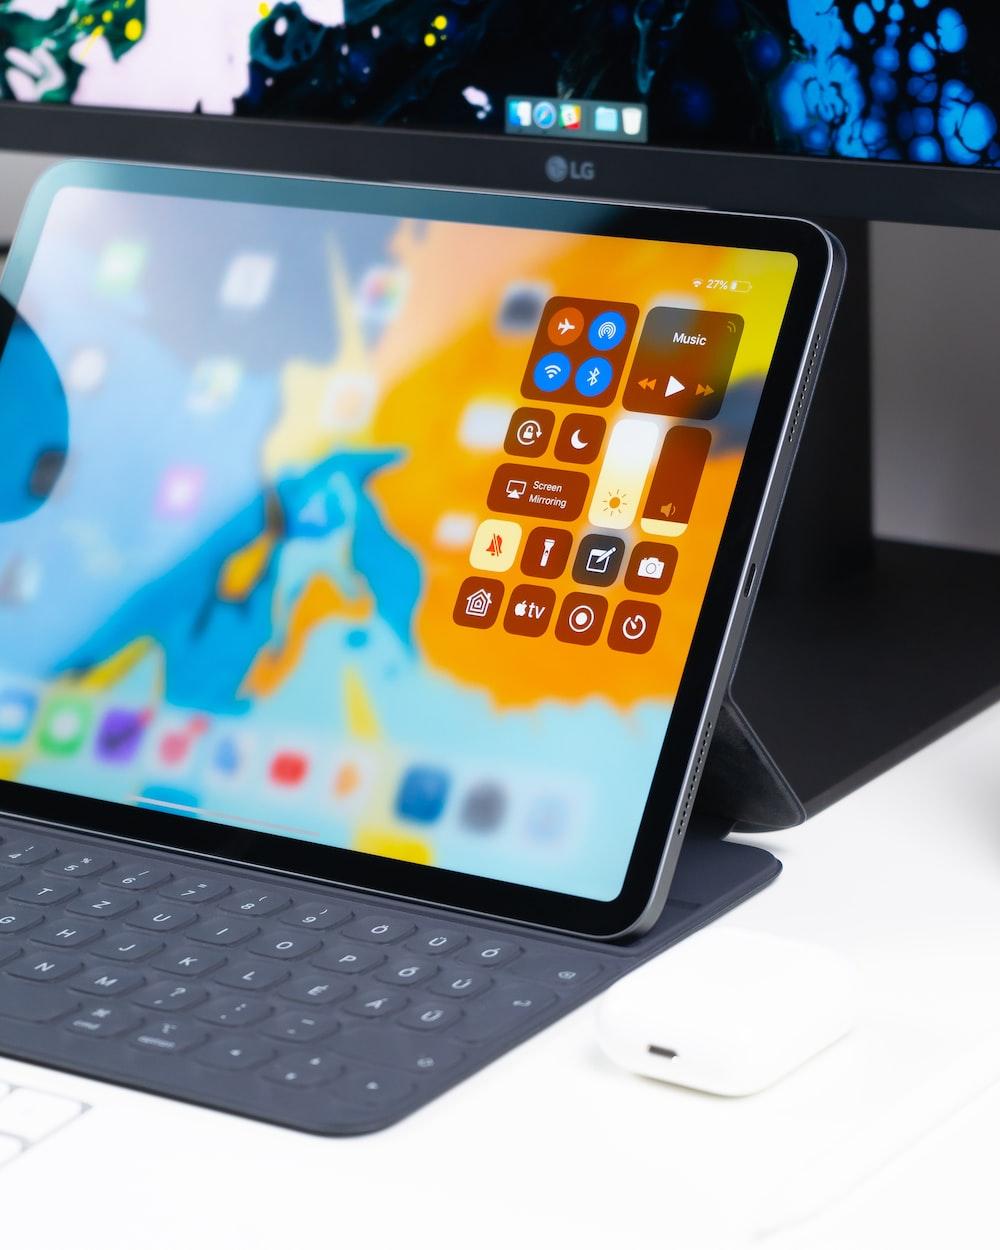 turned on tablet computer on white desk